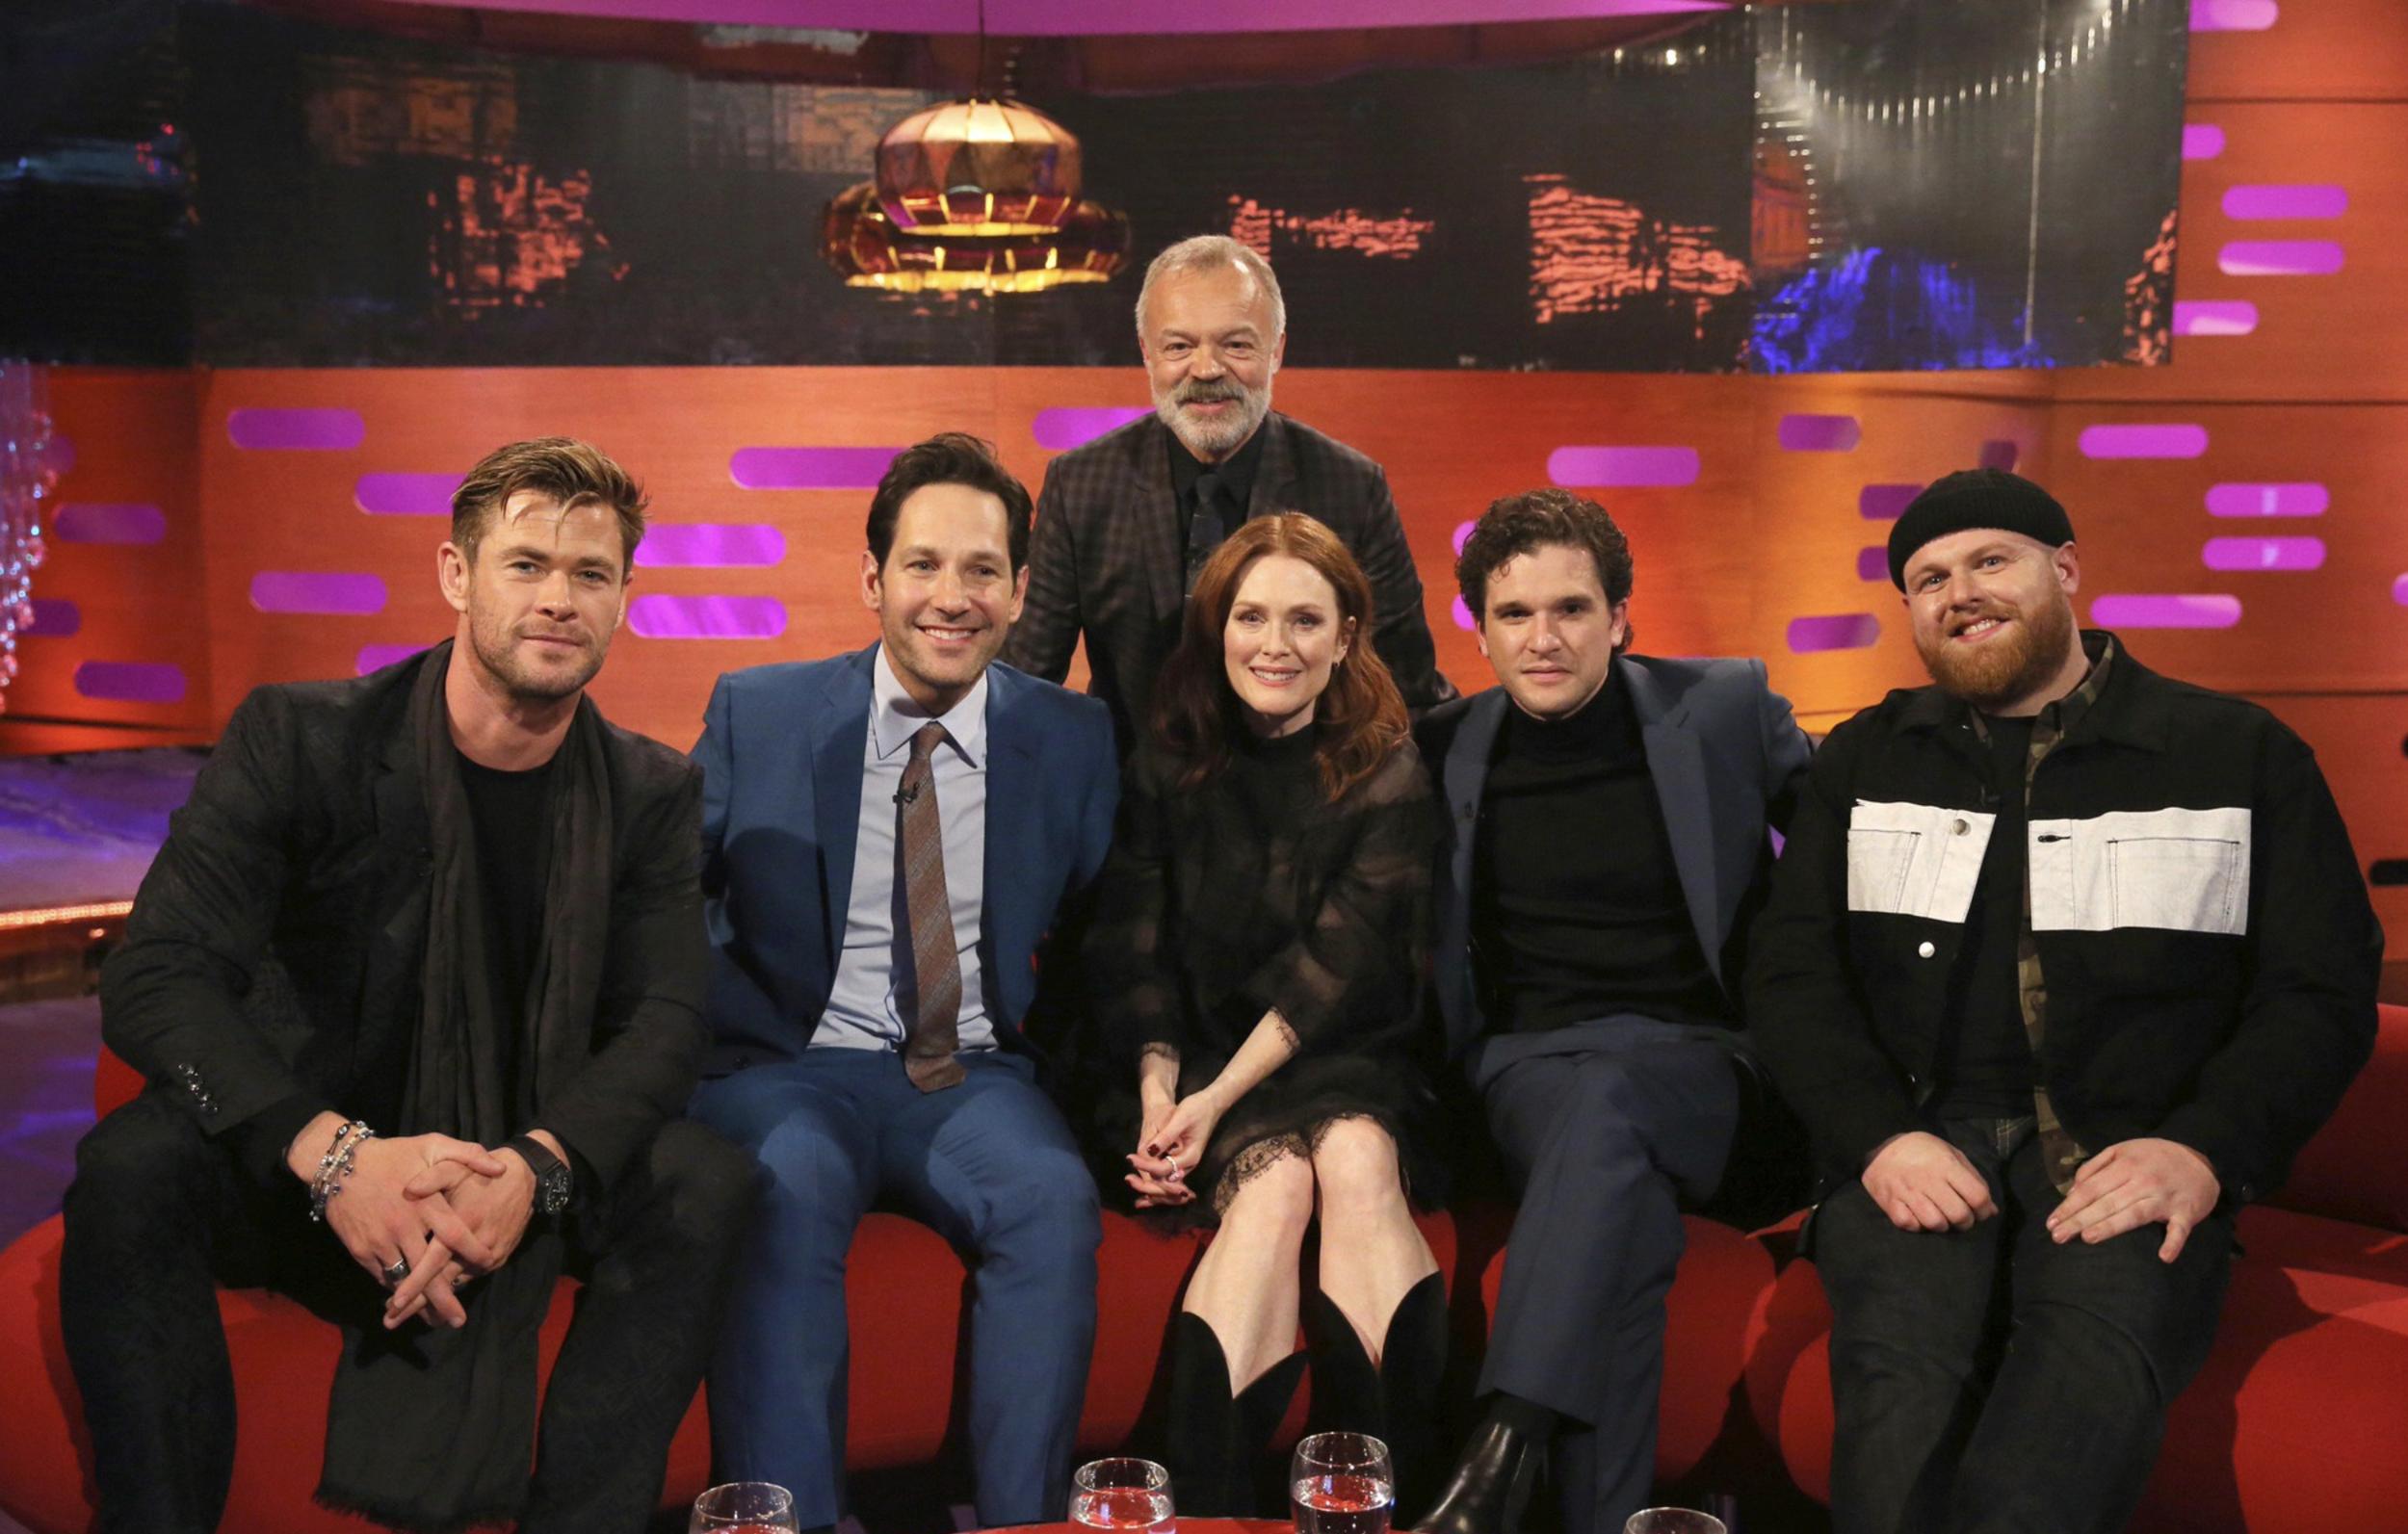 Chris Hemsworth, Paul Rudd, Graham Norton, Julianne Moore, Kit Harrington, Tom Walker on the  The Graham Norton Show